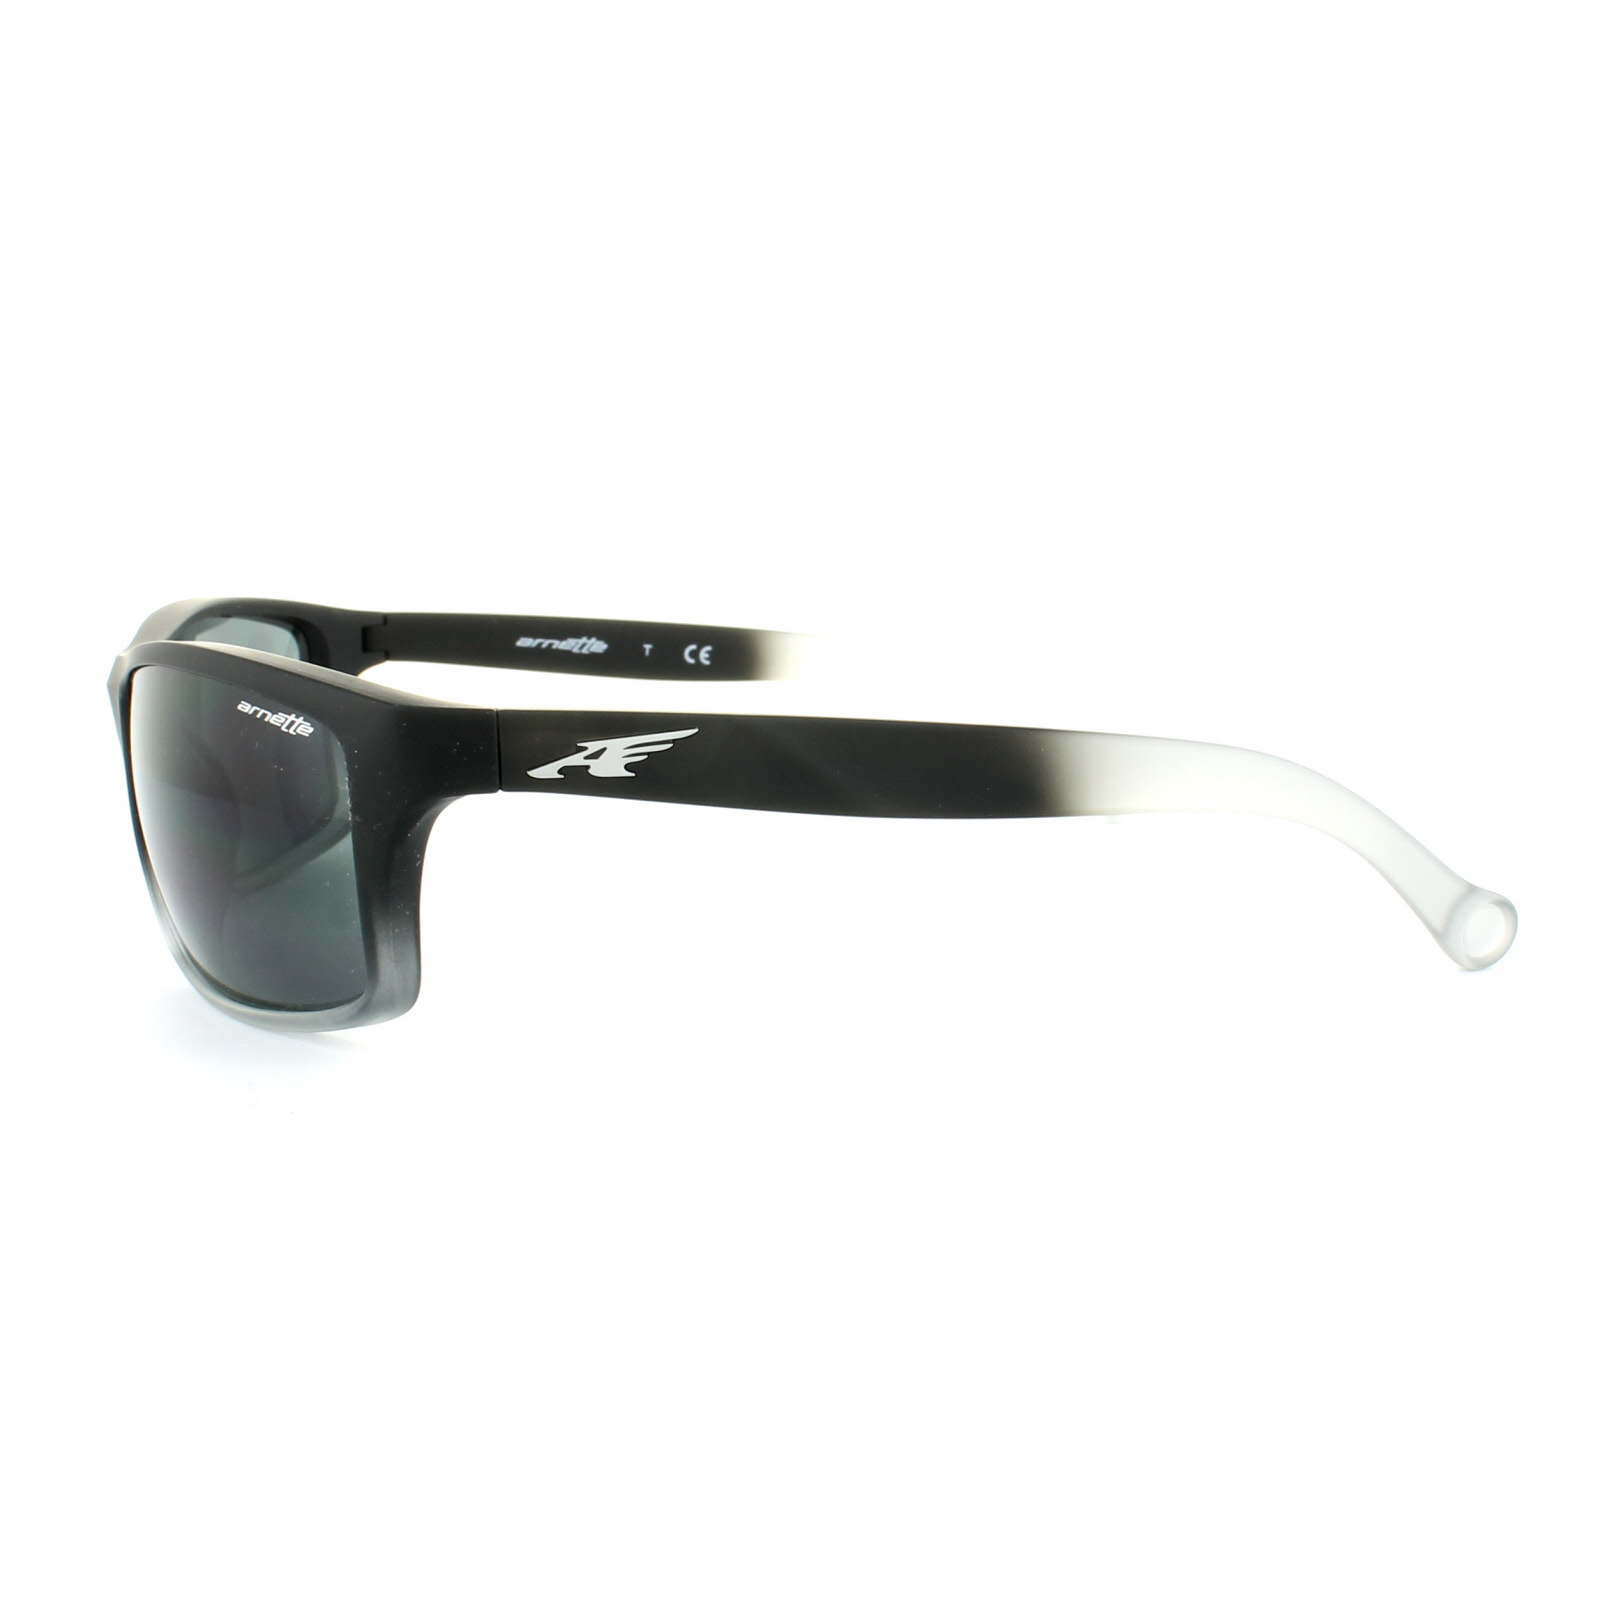 a617afe197 CENTINELA 4207 gafas de Sol Arnette caldera 225387 Fuzzy negro gris gris  translúcido